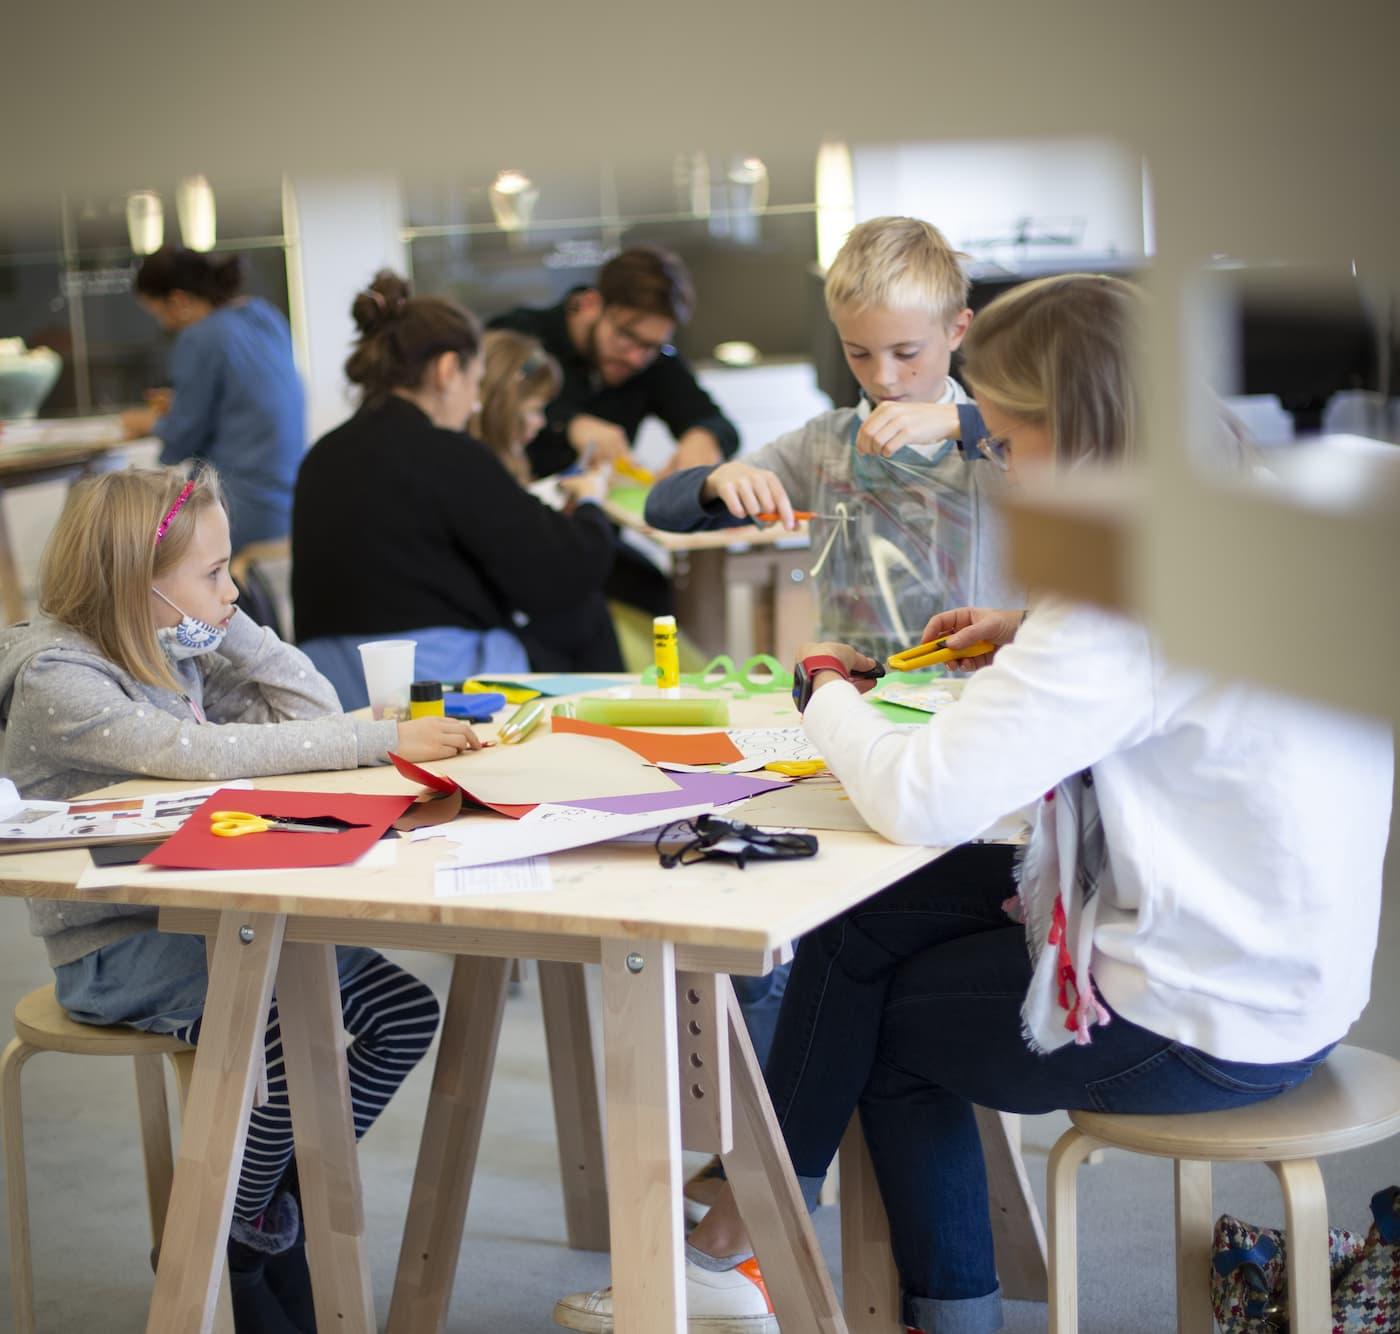 KinderKulturMonat mit Veranstaltungen für Kinder in Berlin // HIMBEER